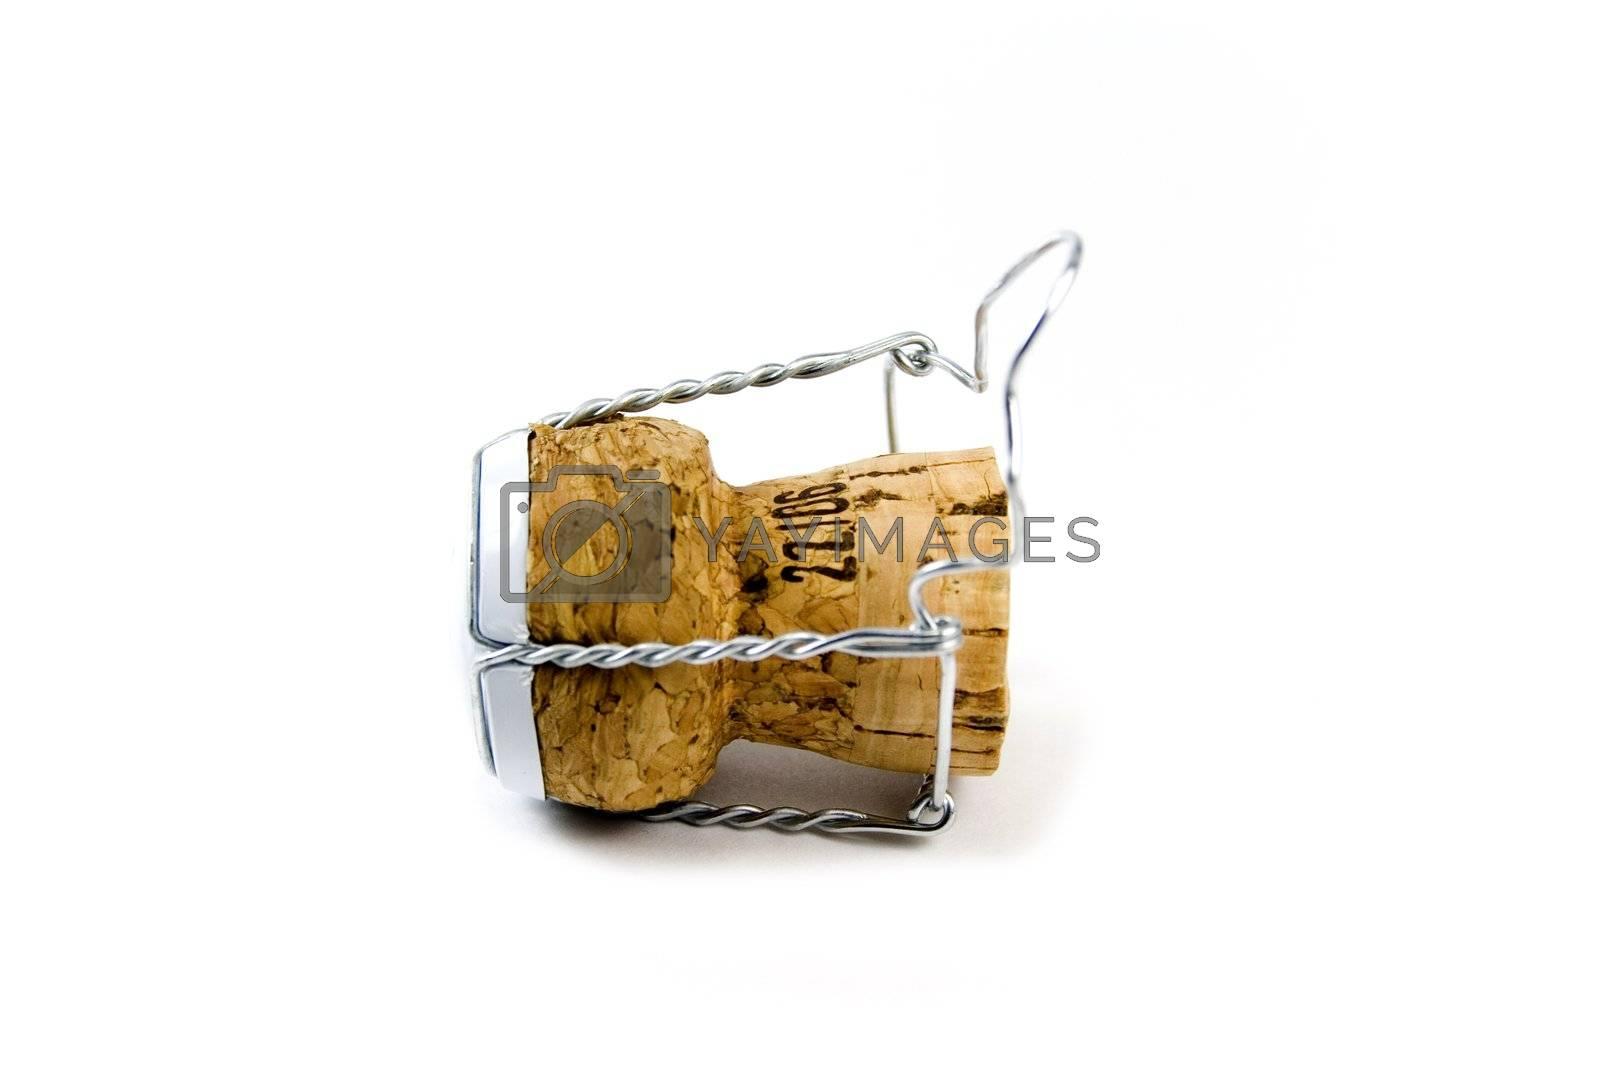 shampagne cork over white background